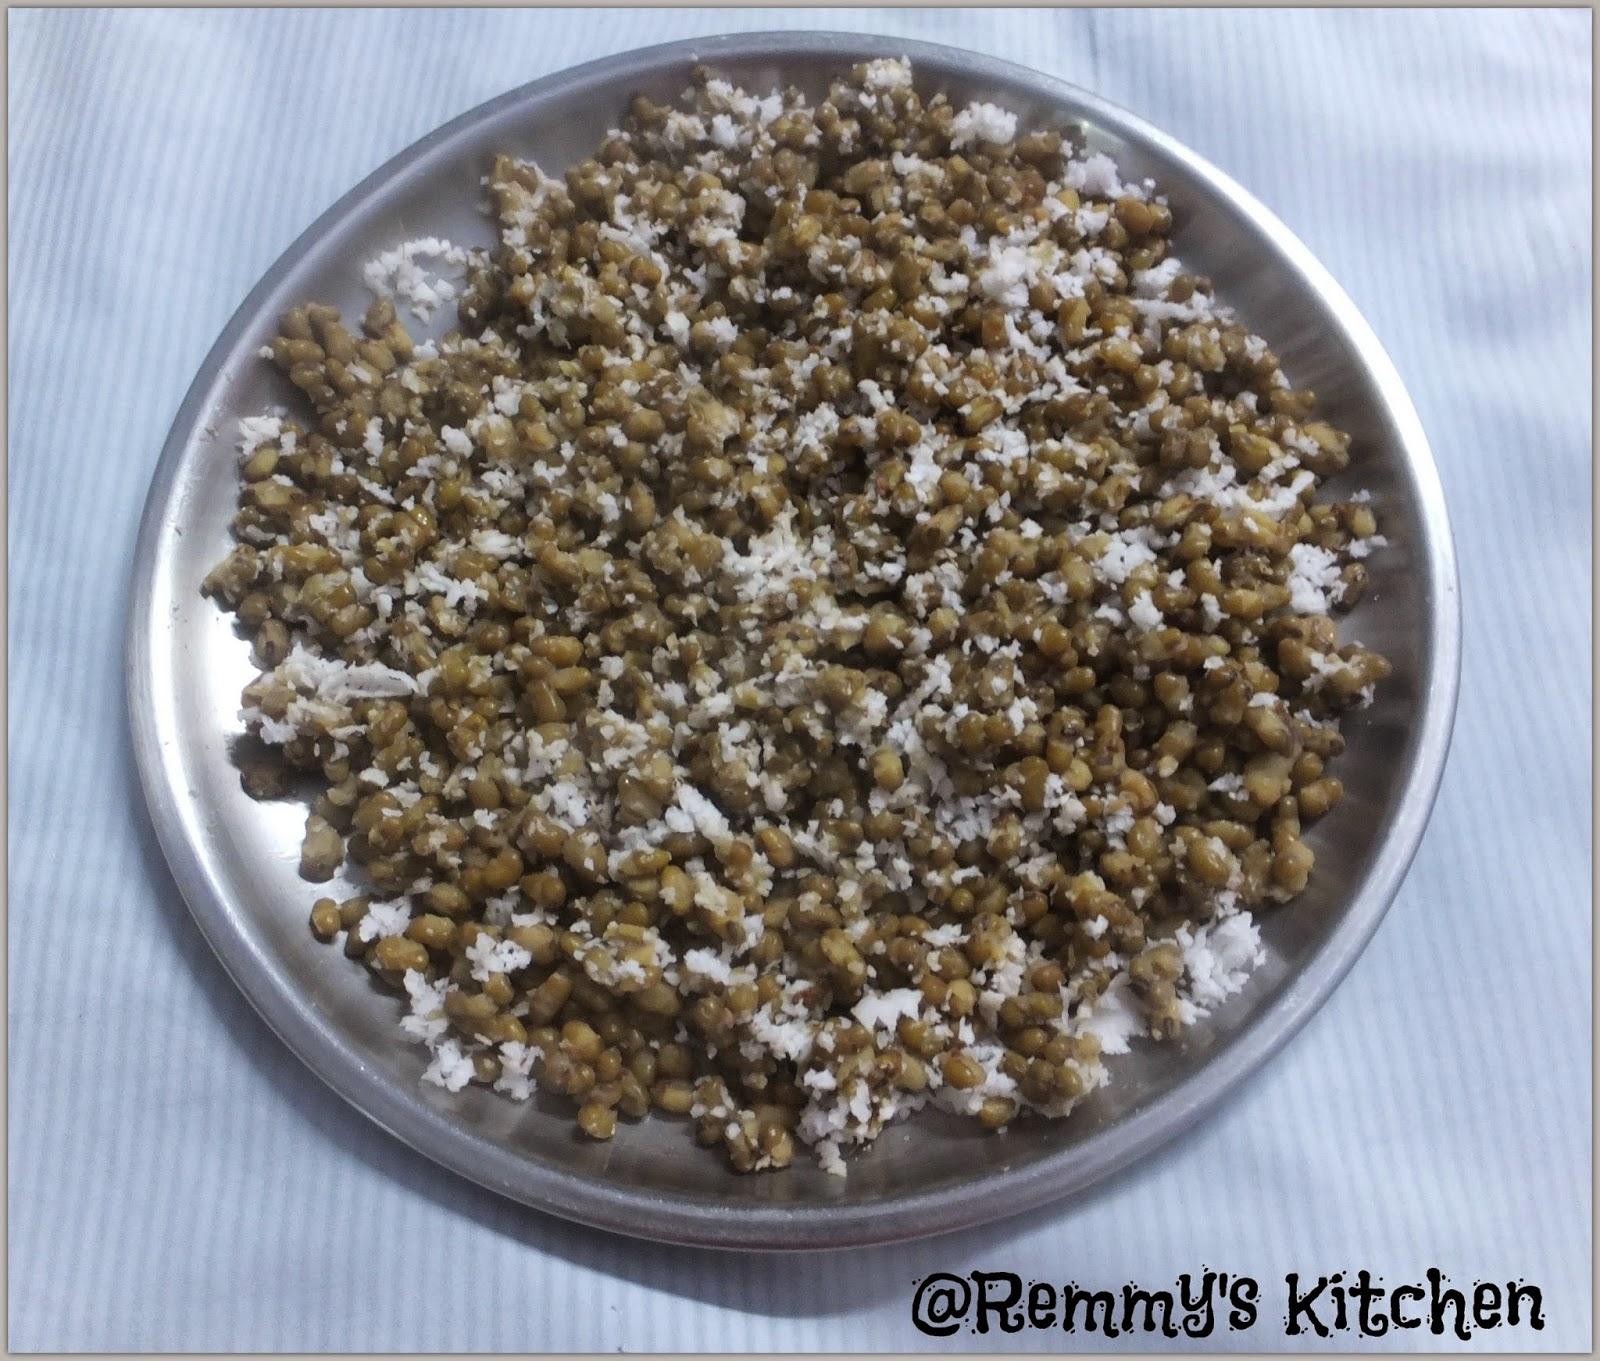 Cherupayar puzhungiyathu / Boiled green gram